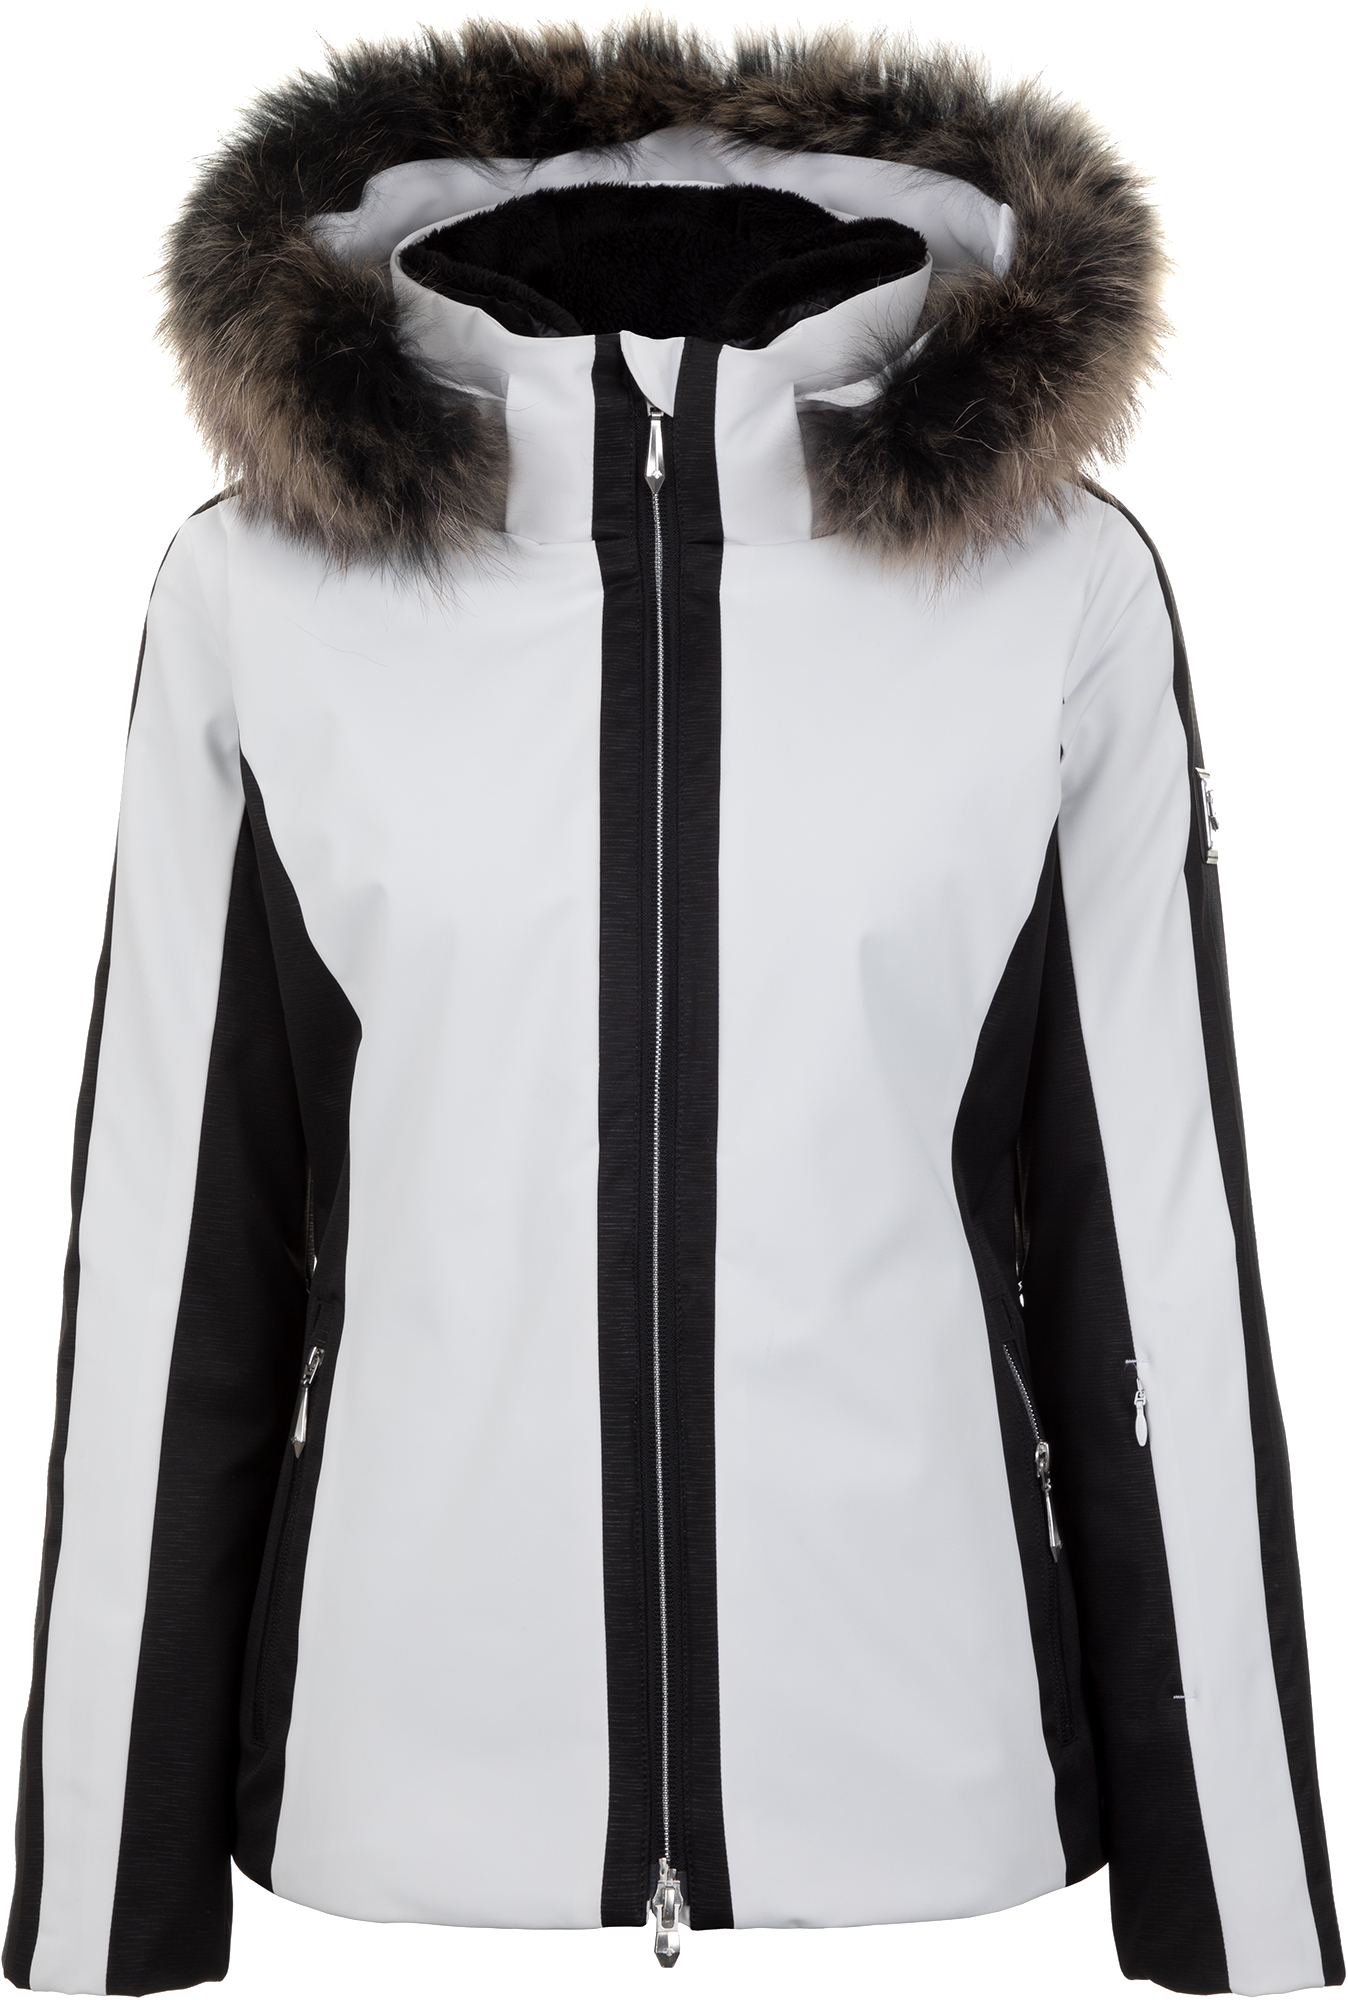 Descente Куртка утепленная женская Descente Gianna, размер 46